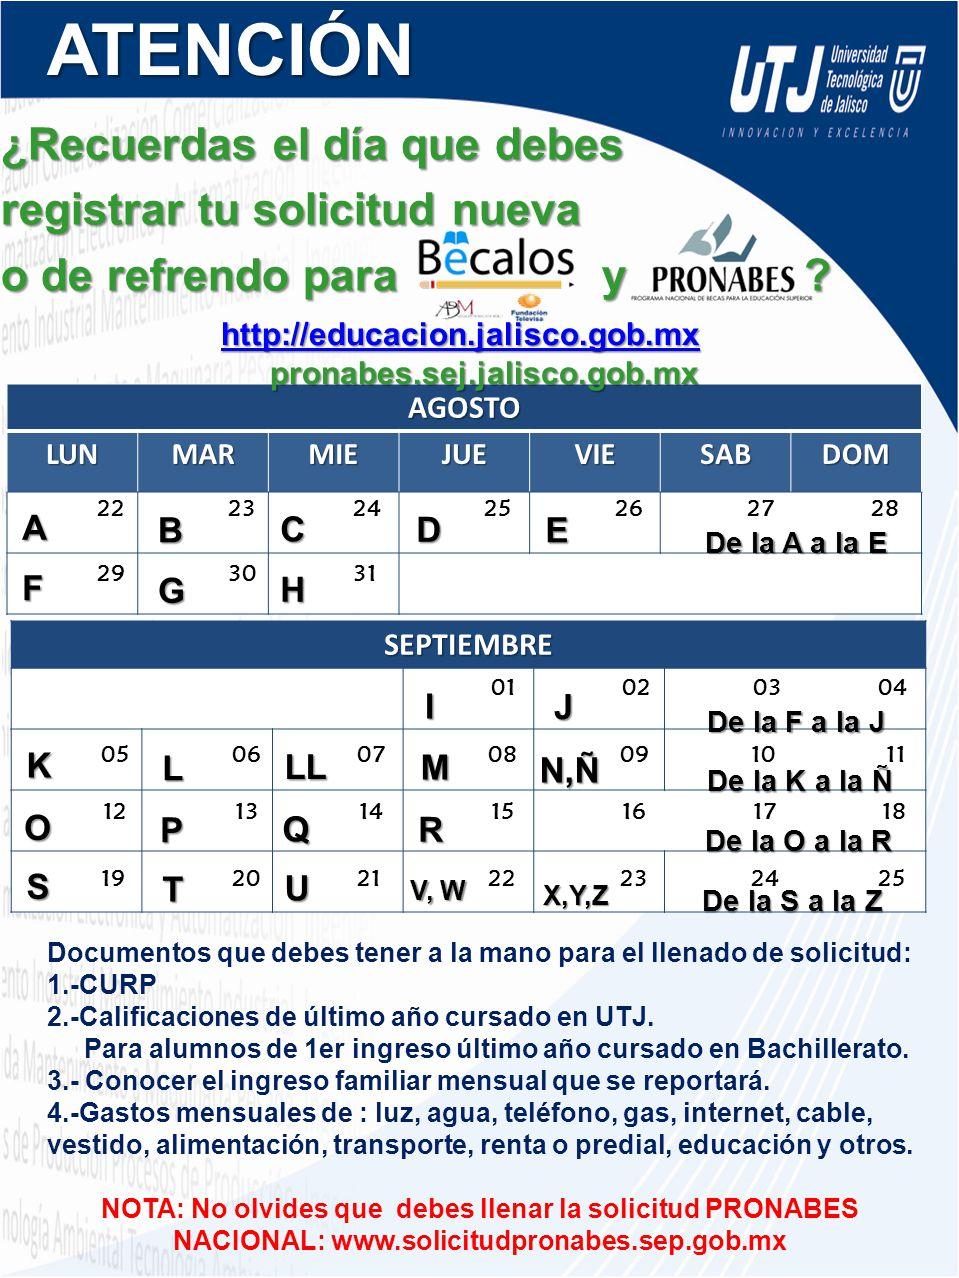 http://educacion.jalisco.gob.mx pronabes.sej.jalisco.gob.mx